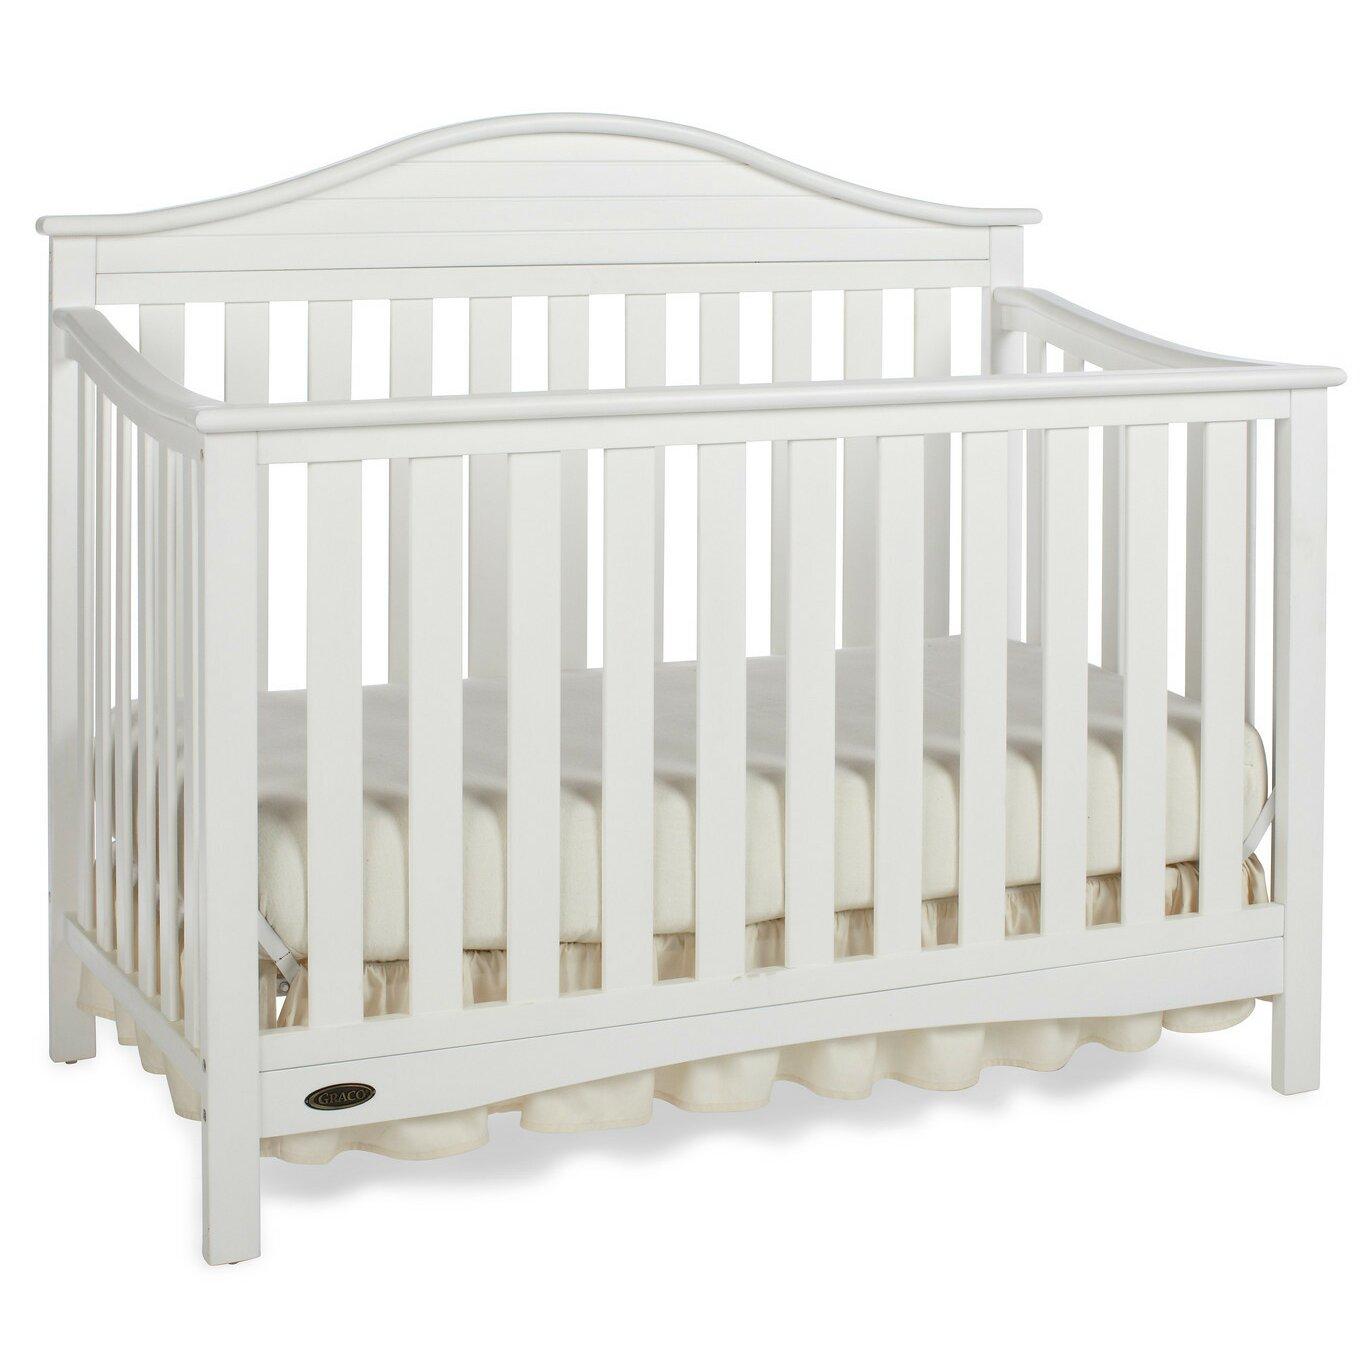 Crib for sale charleston sc - Graco Harbor Lights 4 In 1 Convertible Crib